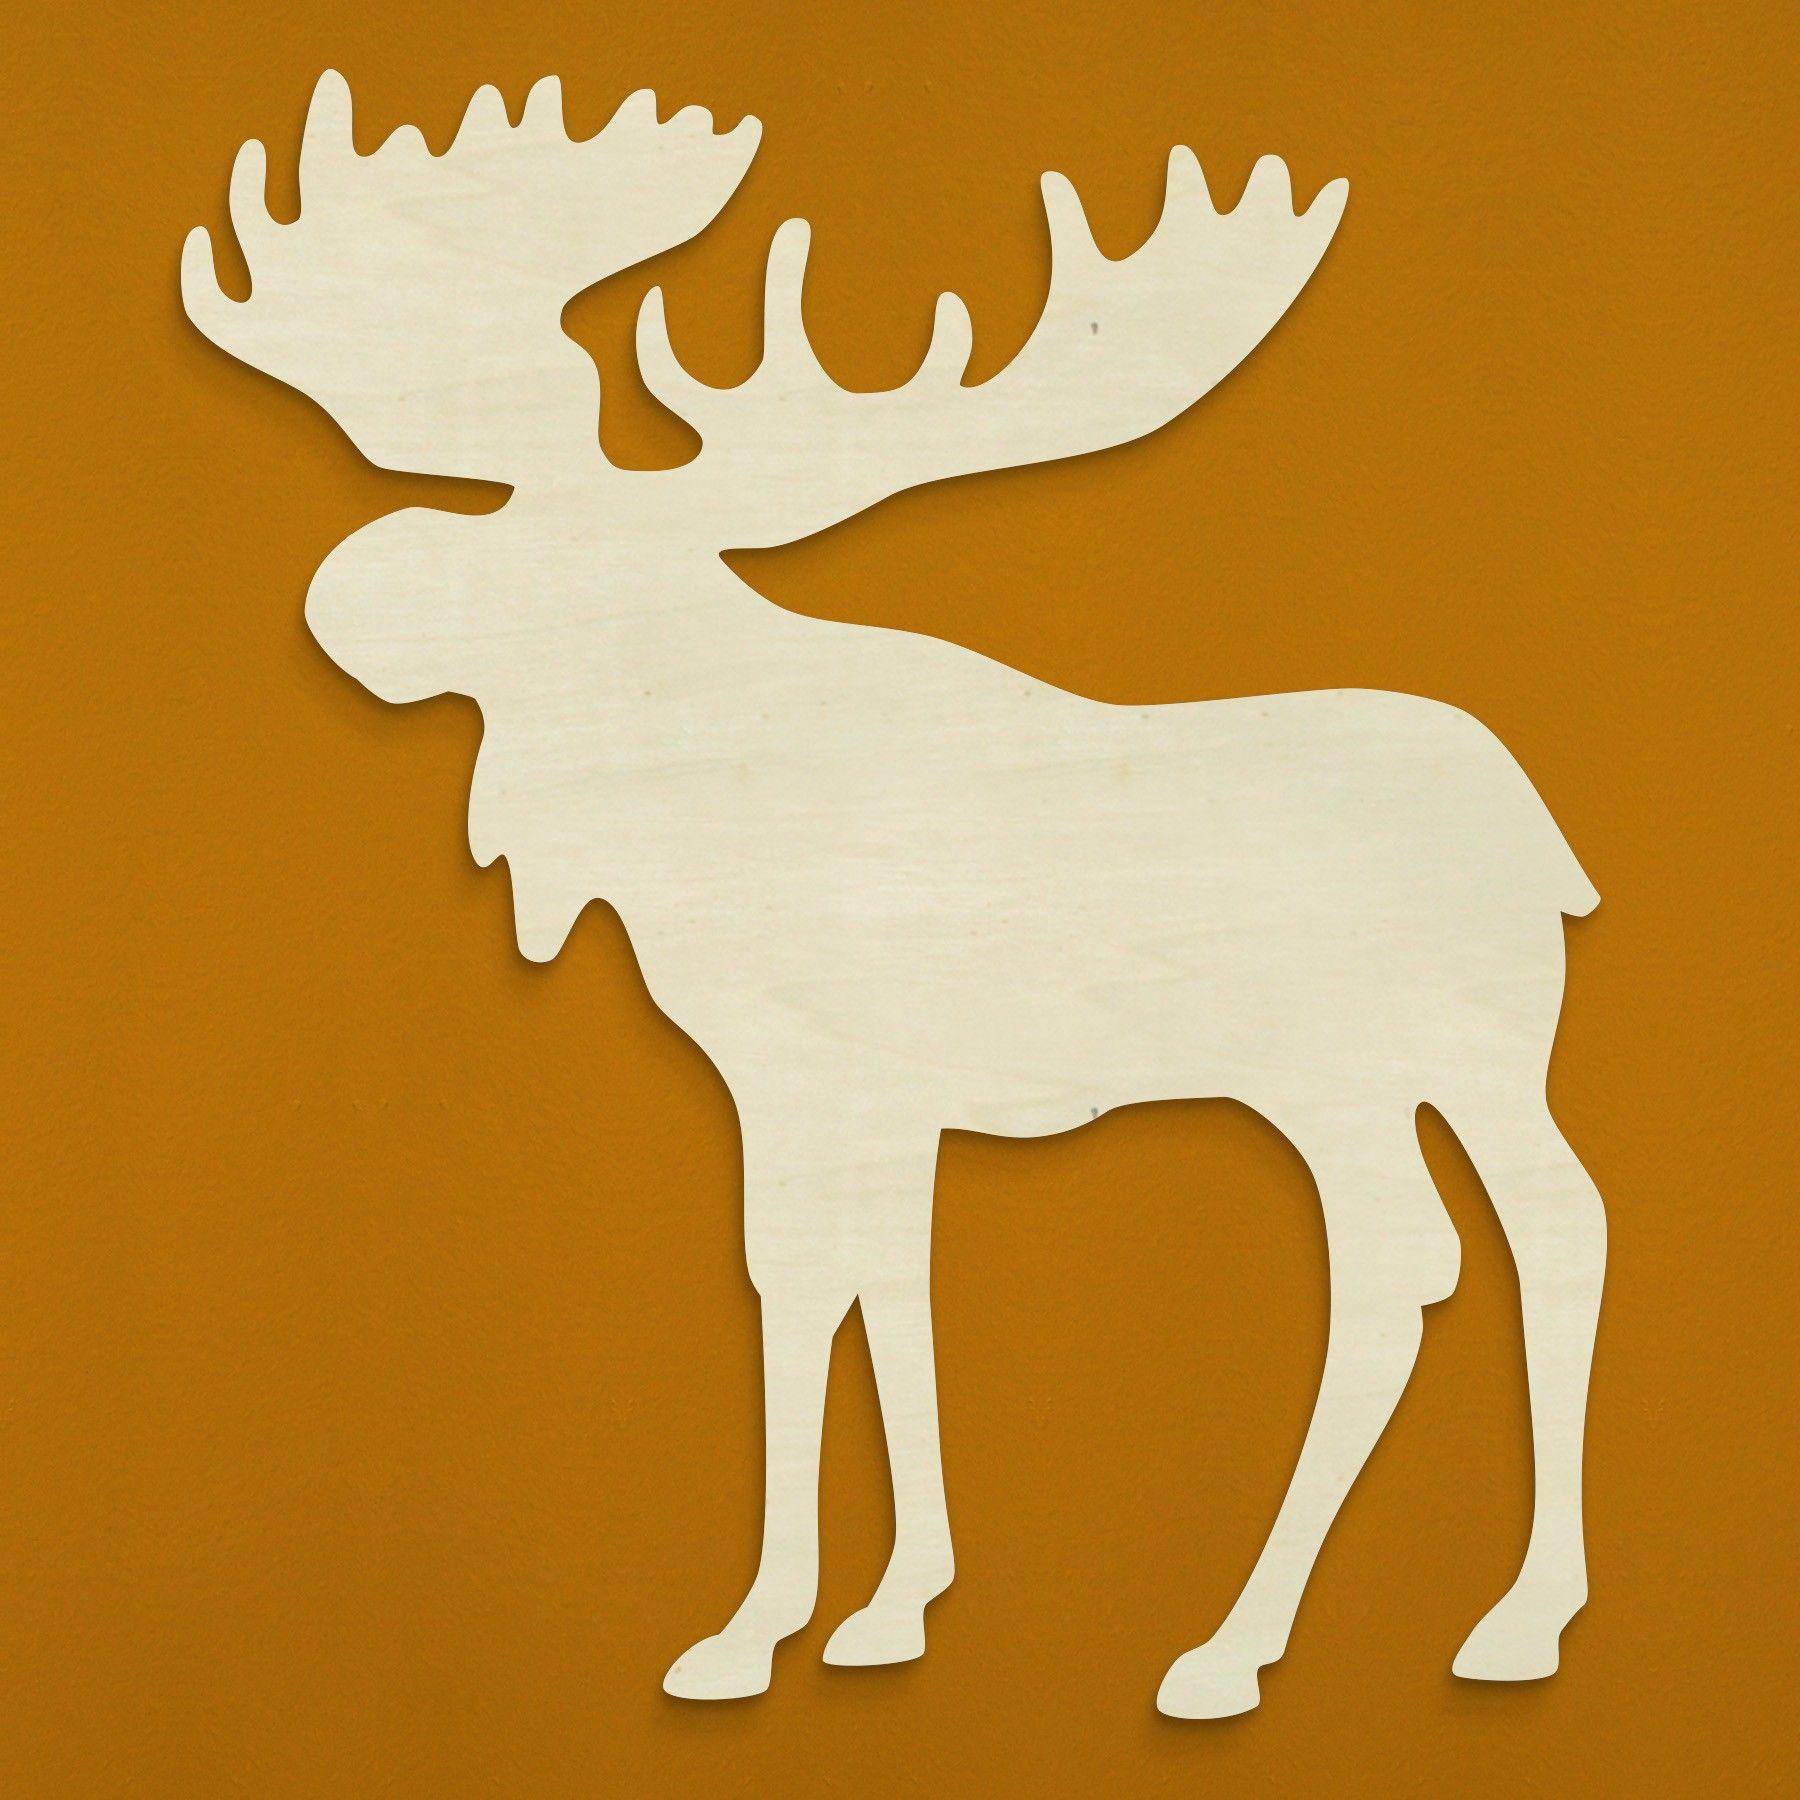 1800x1800 Moosse Silhouette 18.5 Moose Silhouette Silohettes